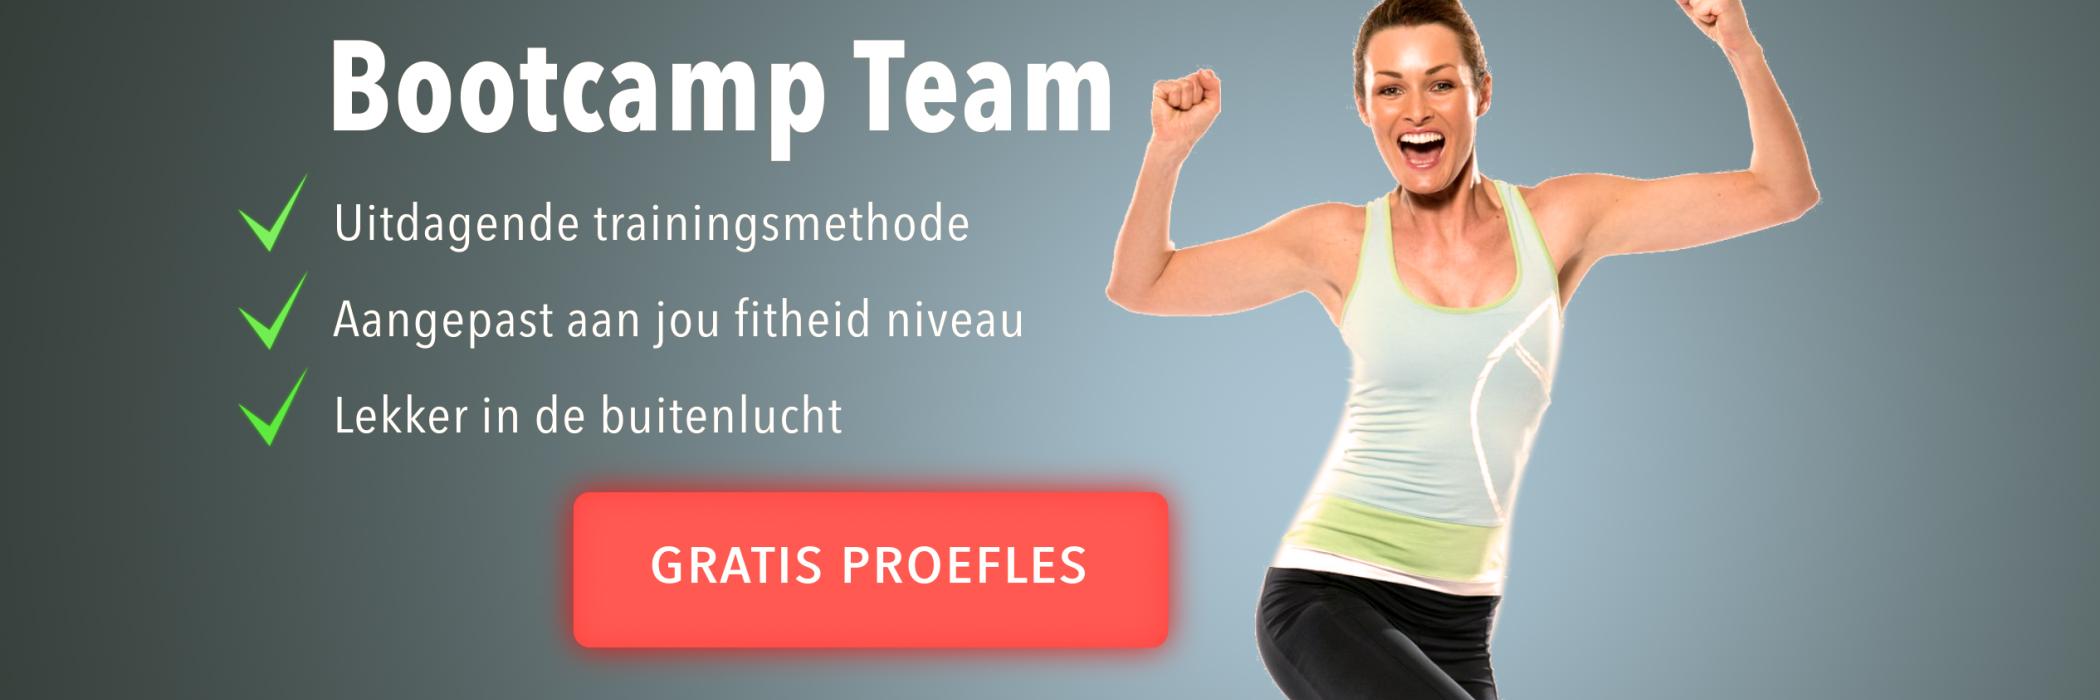 Fitness club Den Haag Club Vit bootcamp